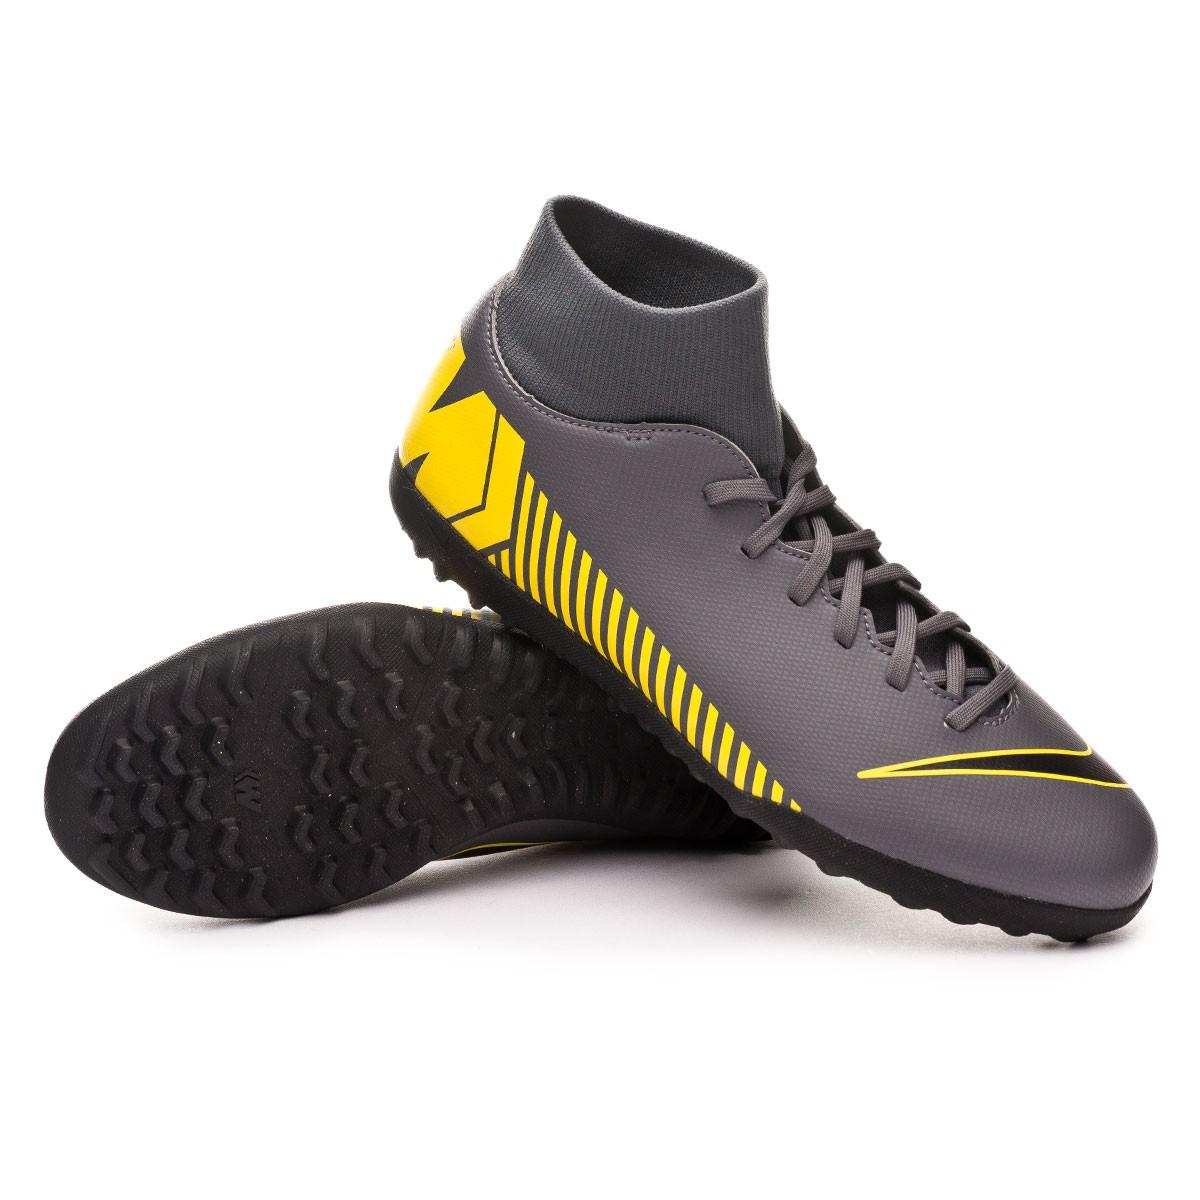 Football Boot Nike Mercurial SuperflyX